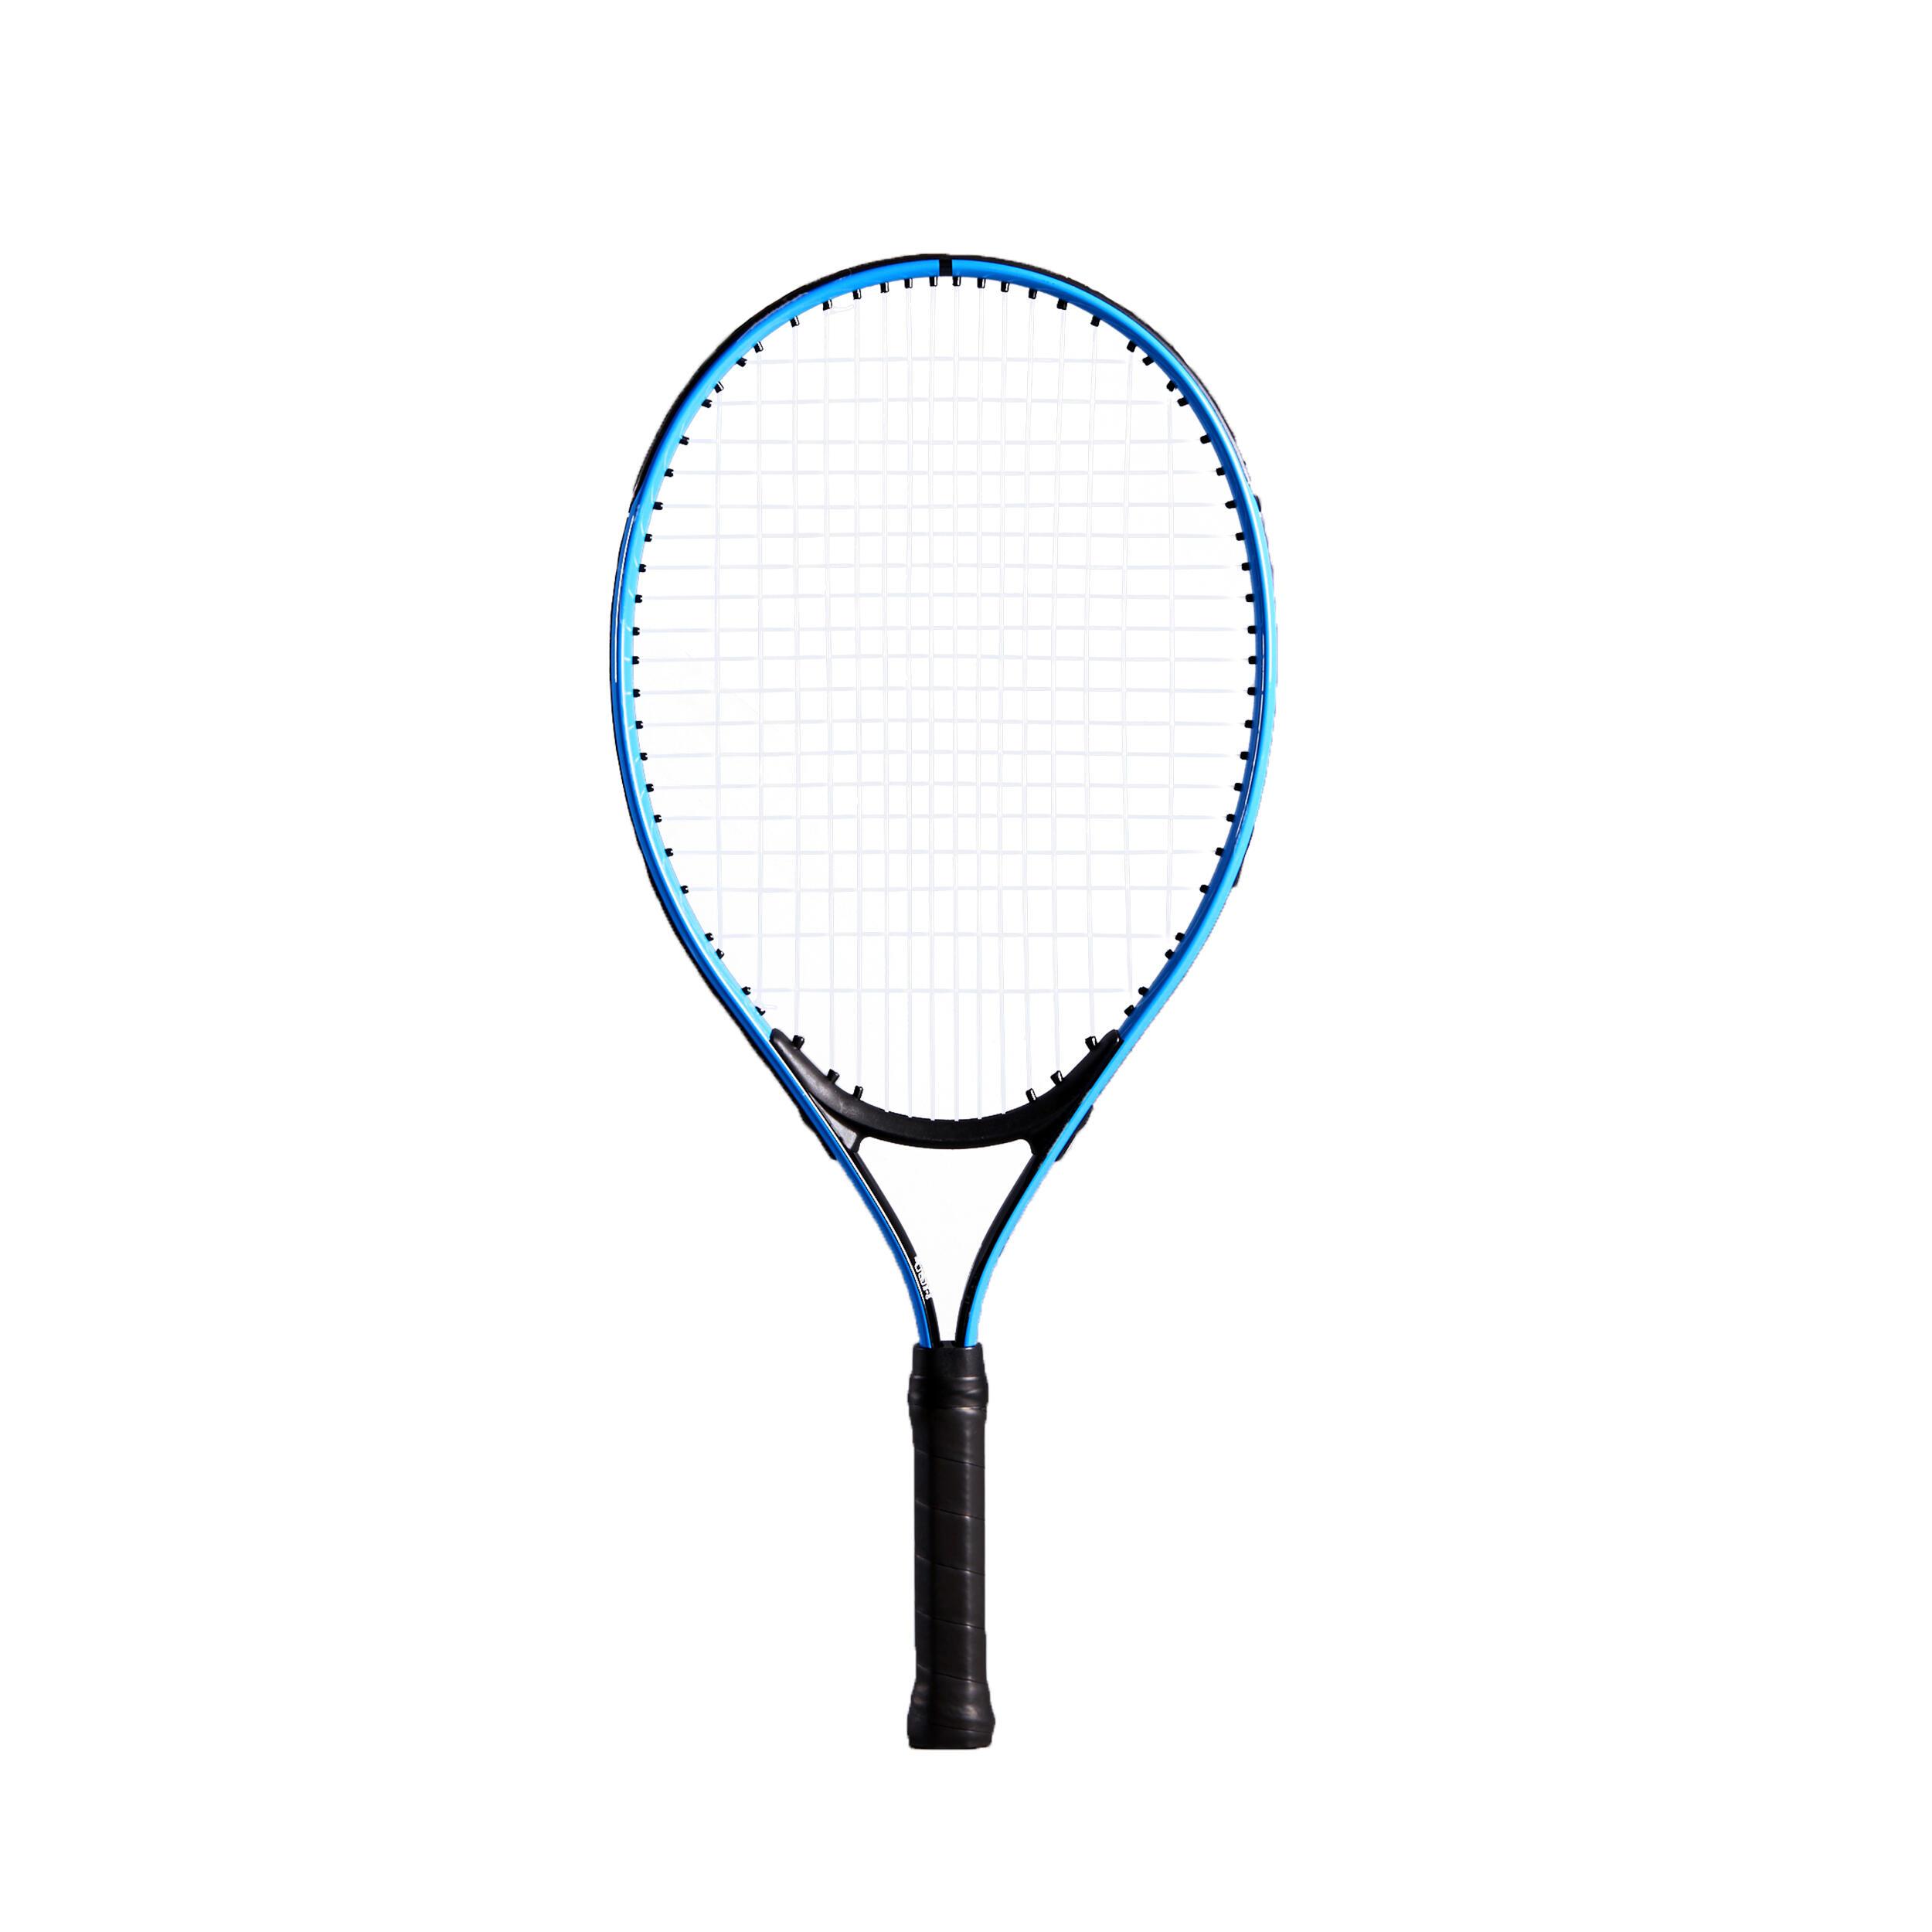 Rachetă Tenis TR100 M23 Copii imagine